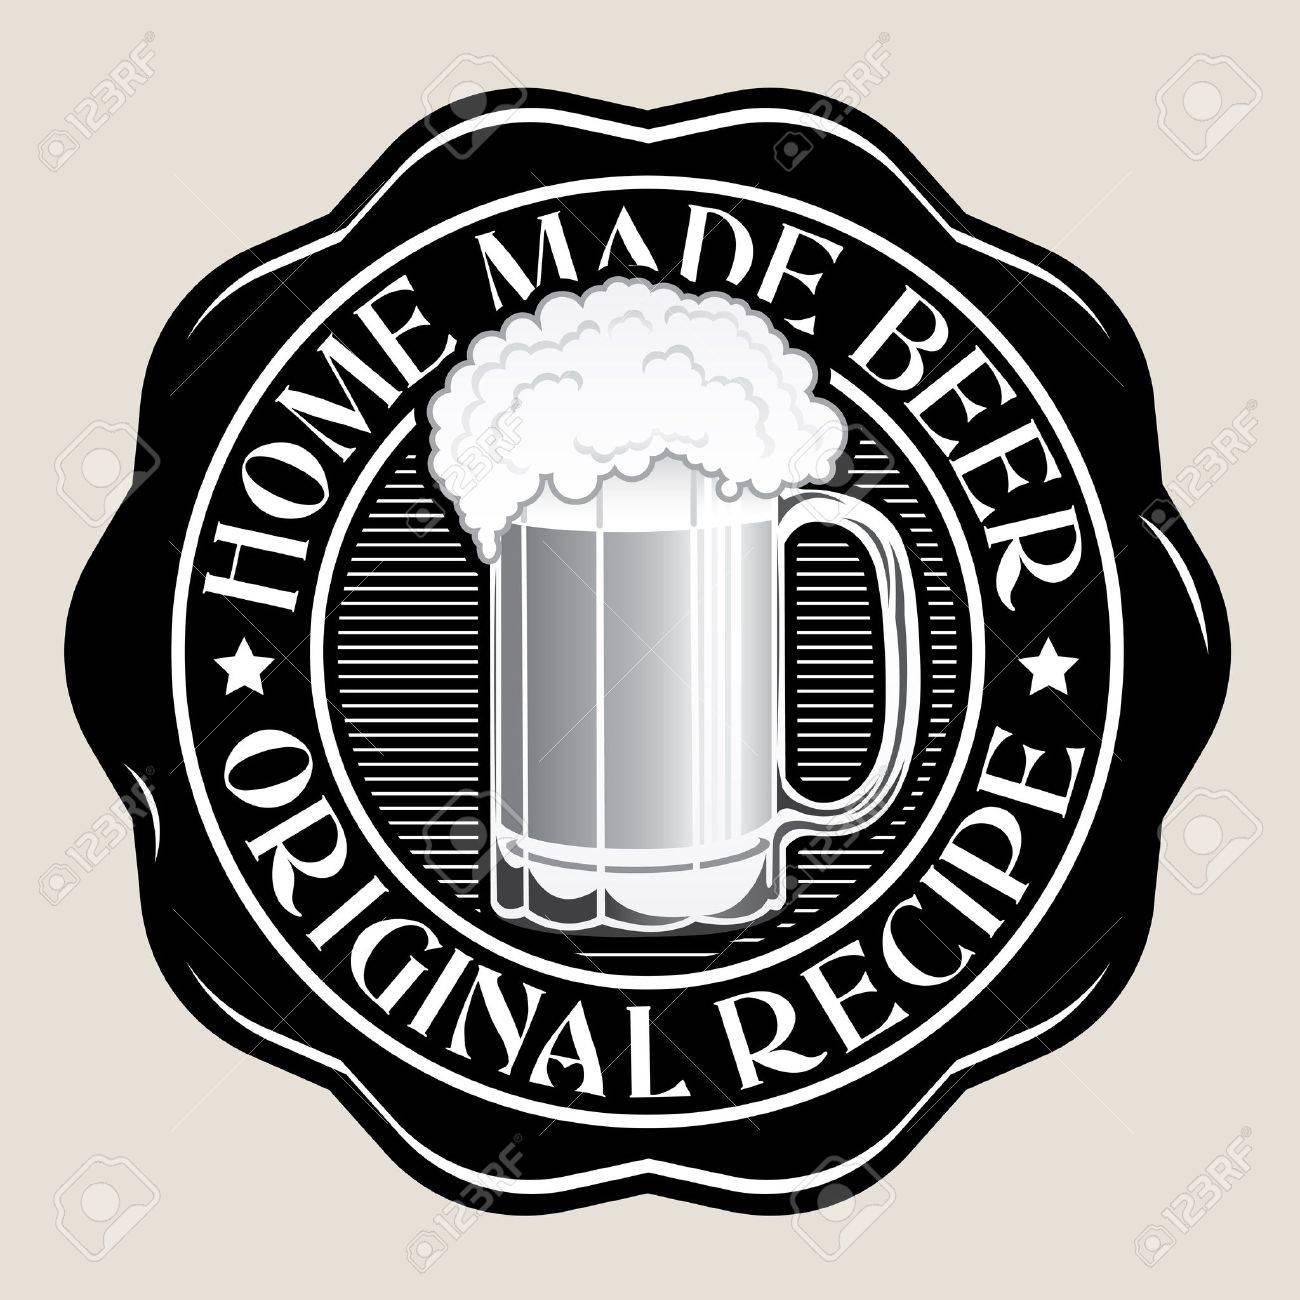 Home Made Beer / Original Recipe Seal Stock Vector - 16556401